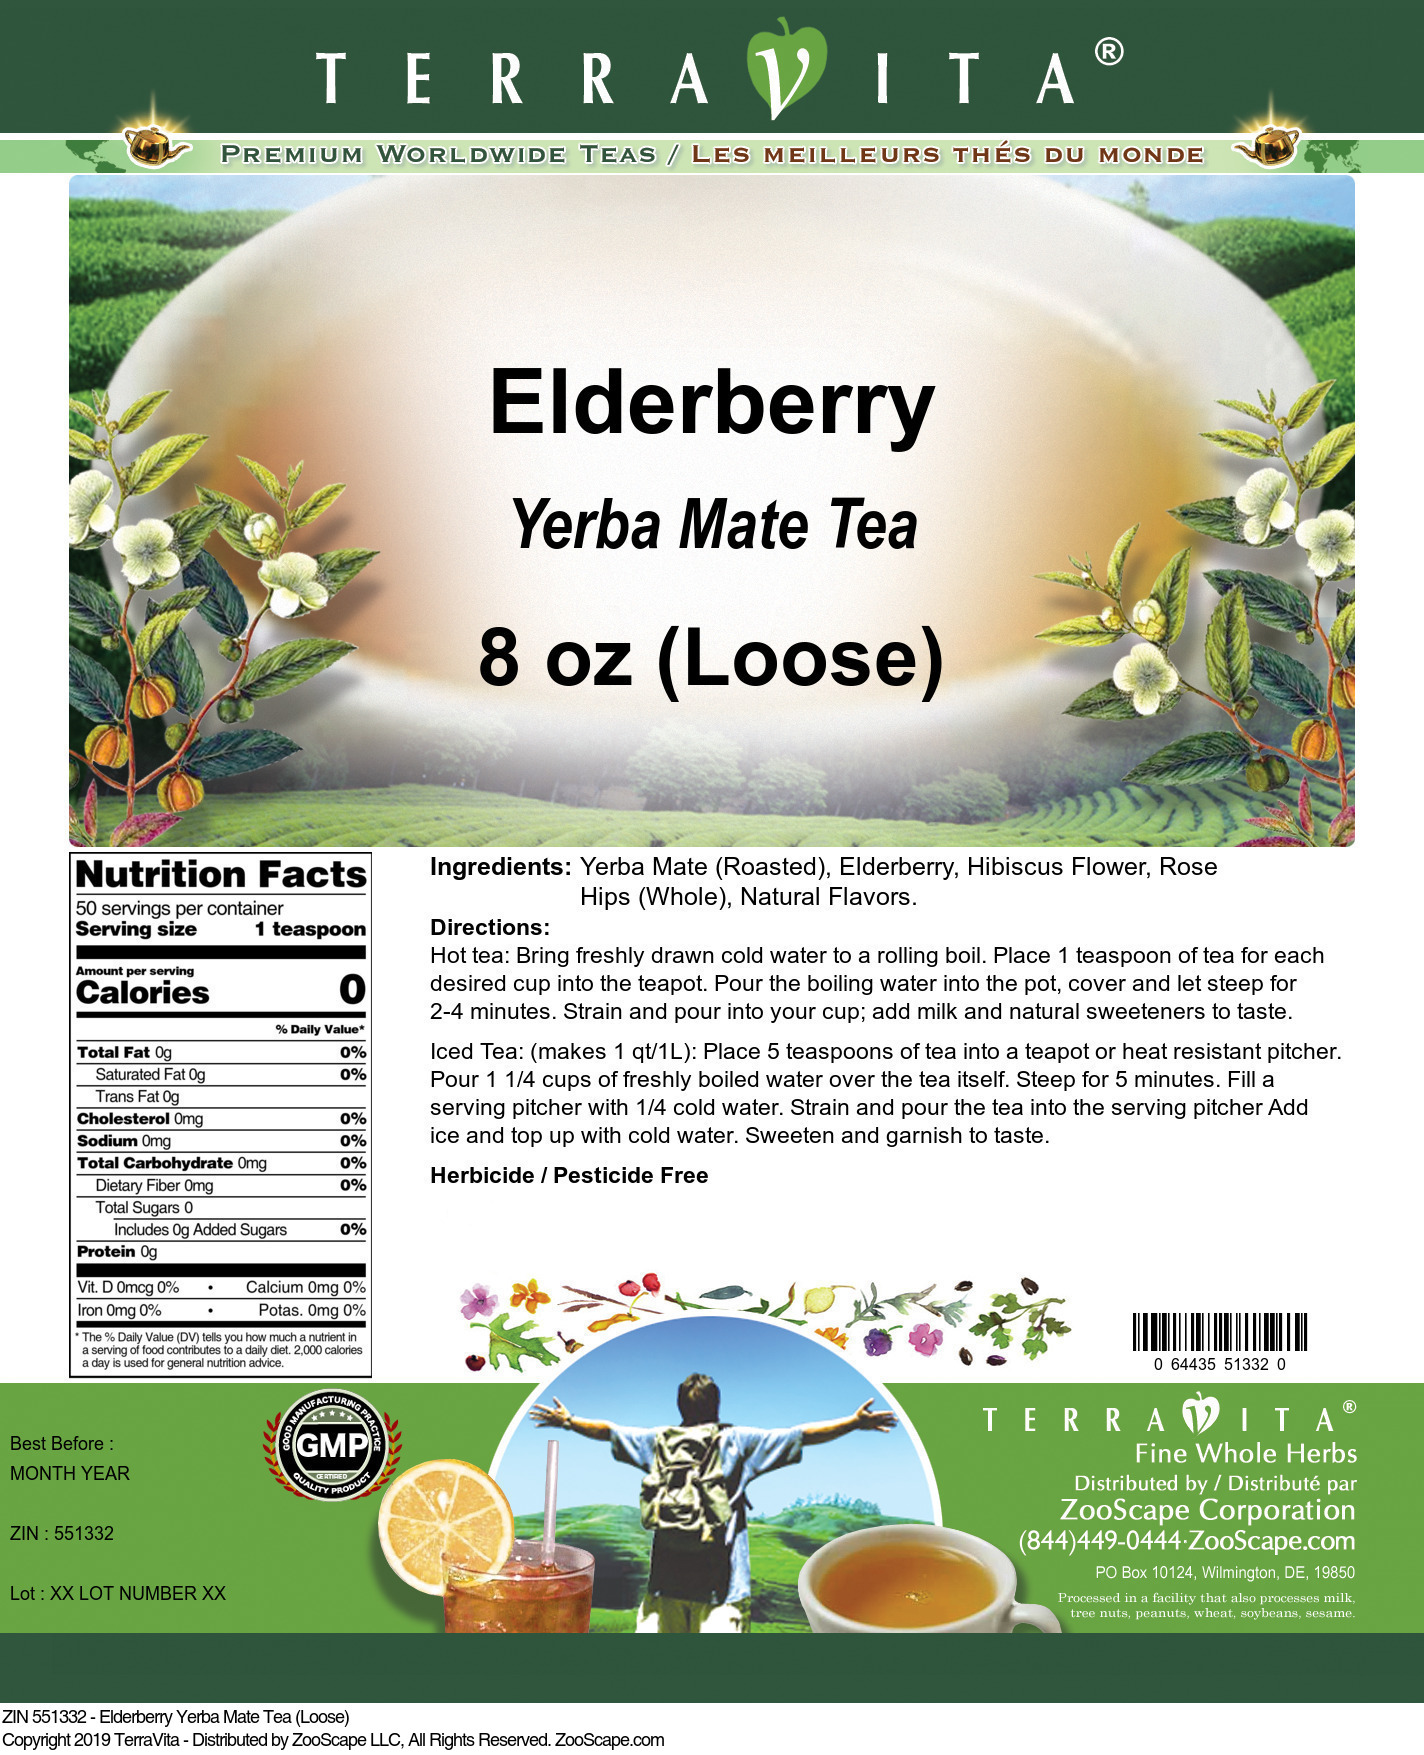 Elderberry Yerba Mate Tea (Loose)